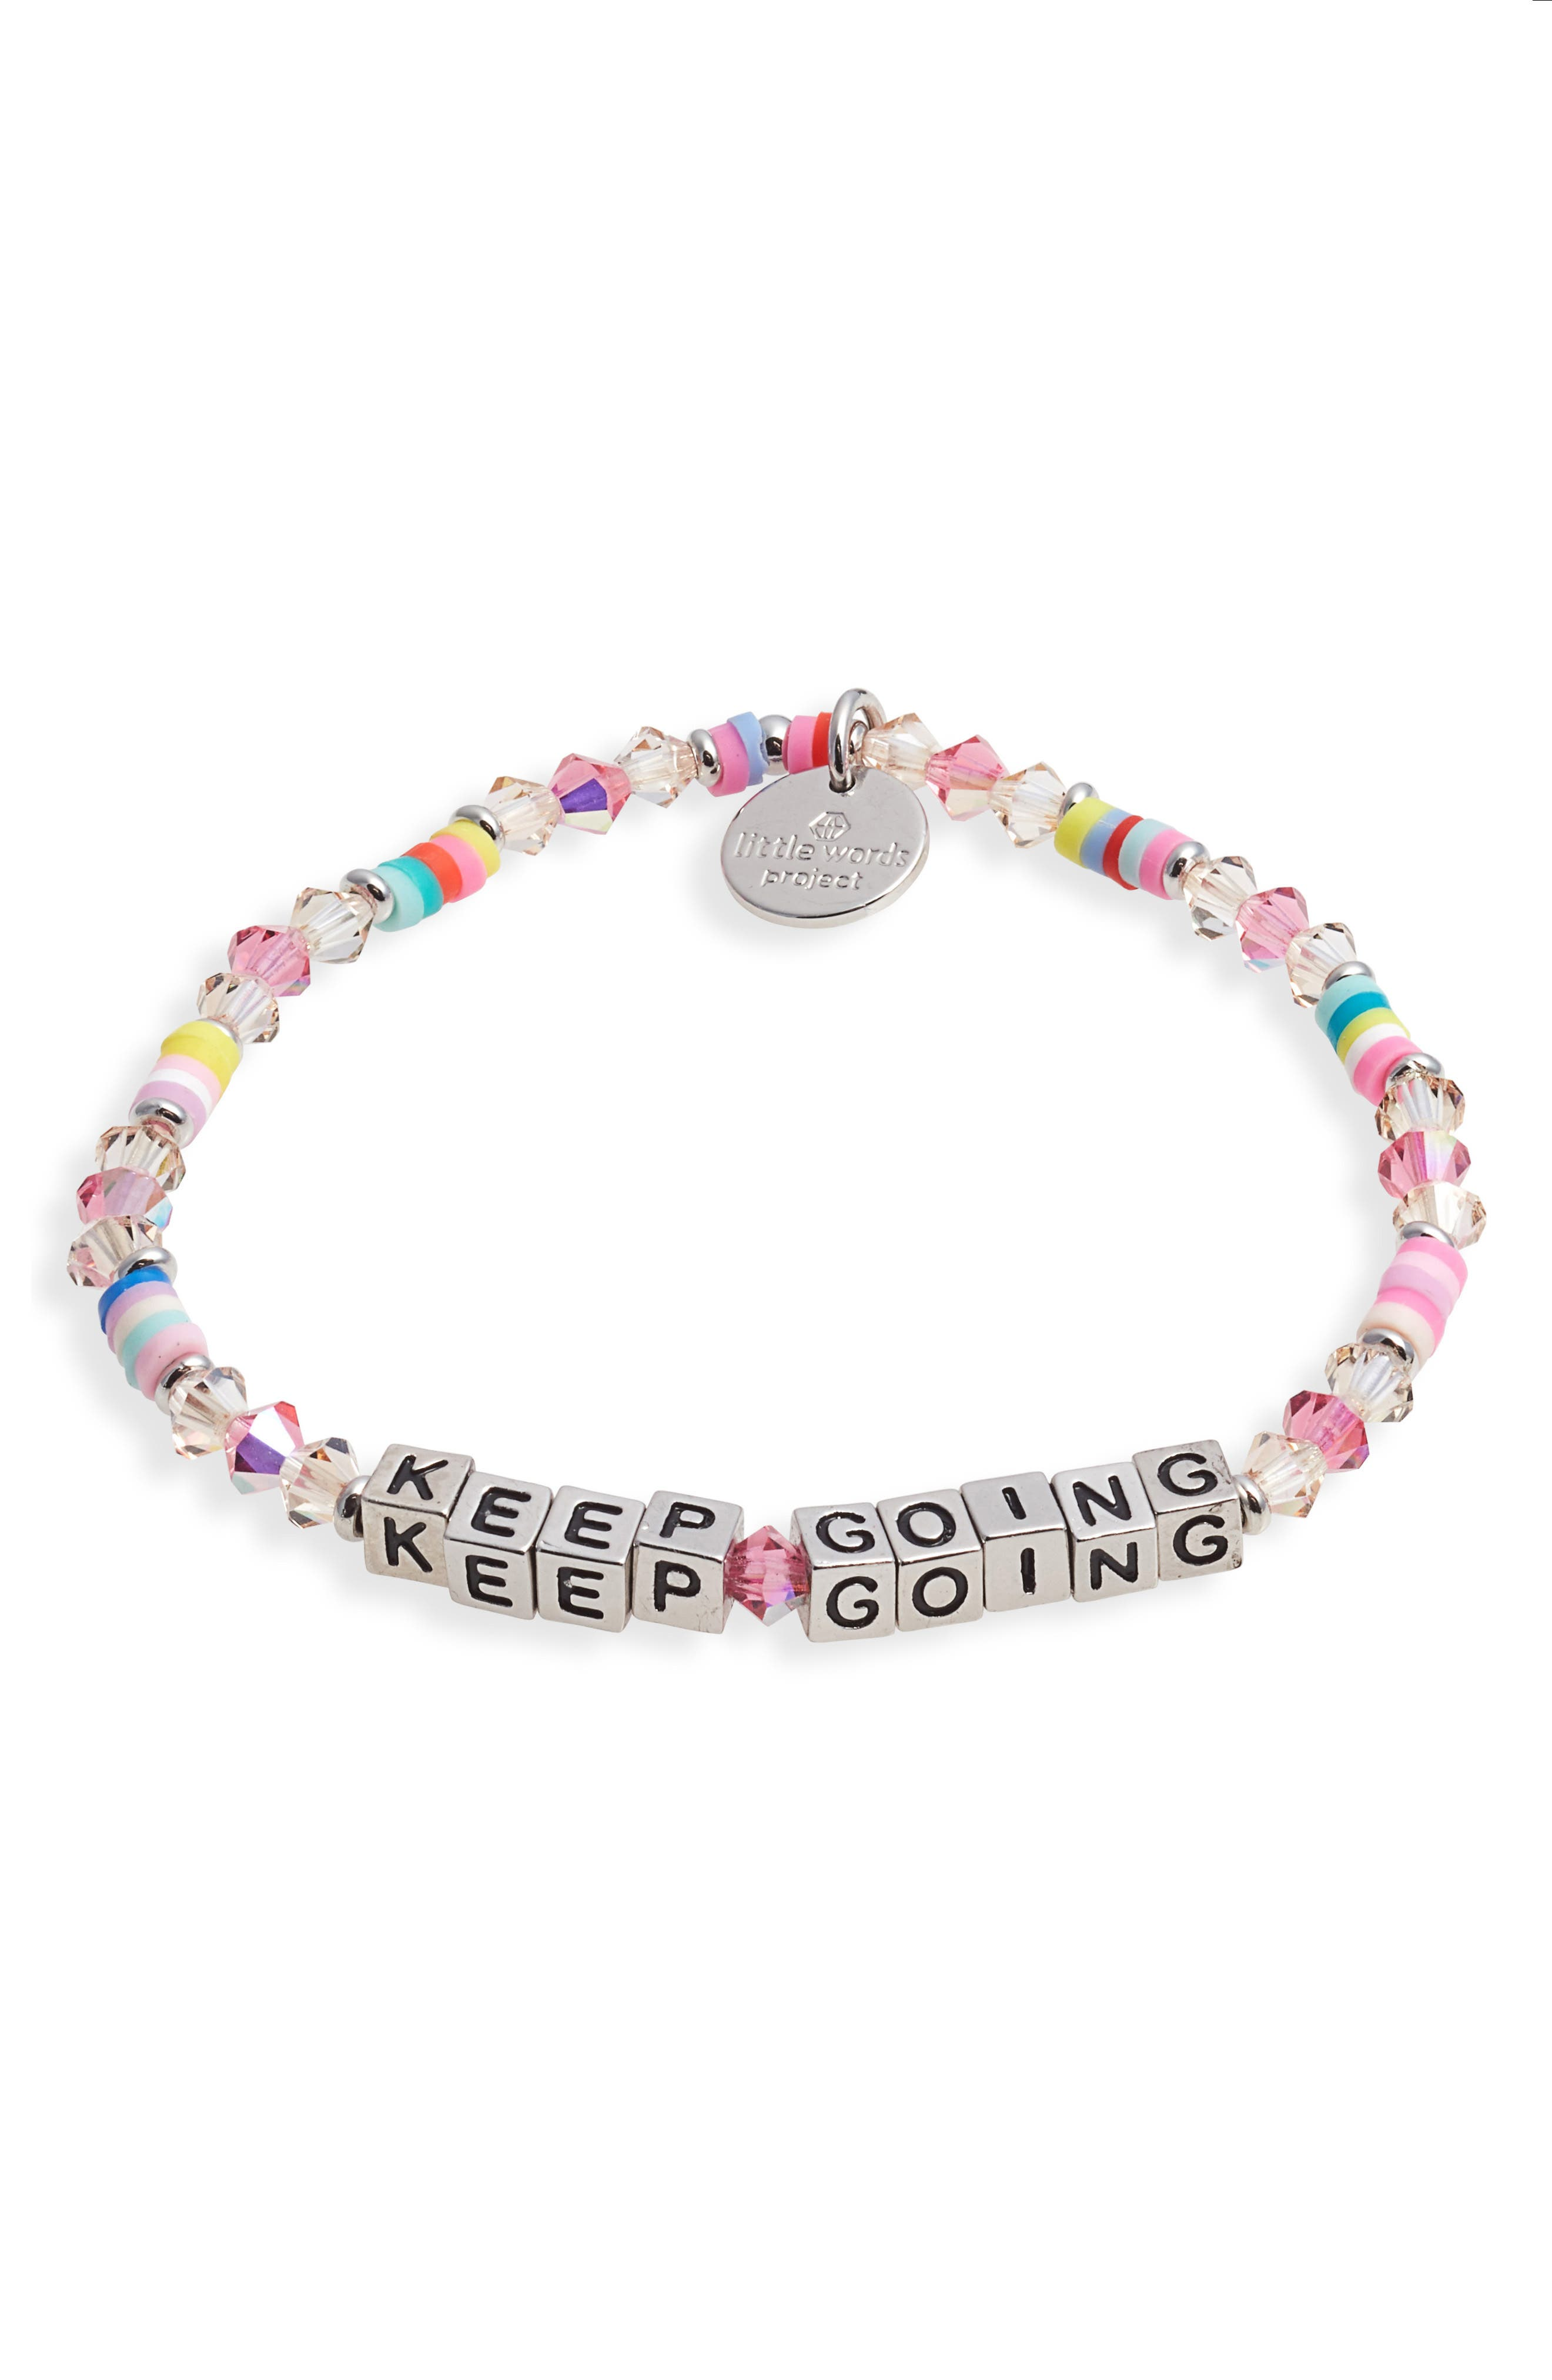 Keep Going Beaded Stretch Bracelet